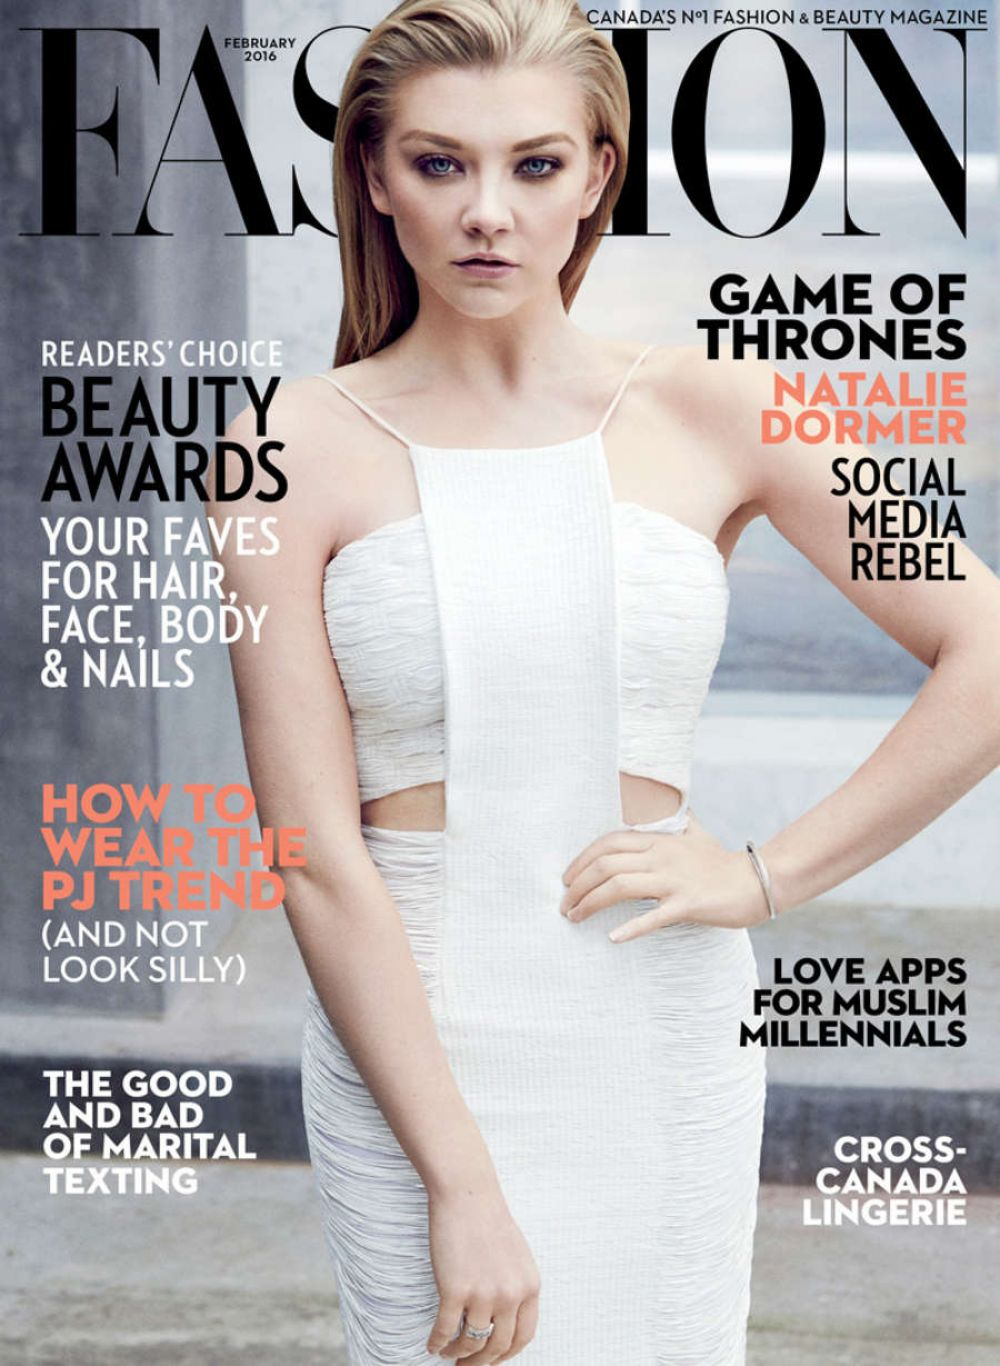 NATALIE DORMER In Fashion Magazine, February 2016 Issue